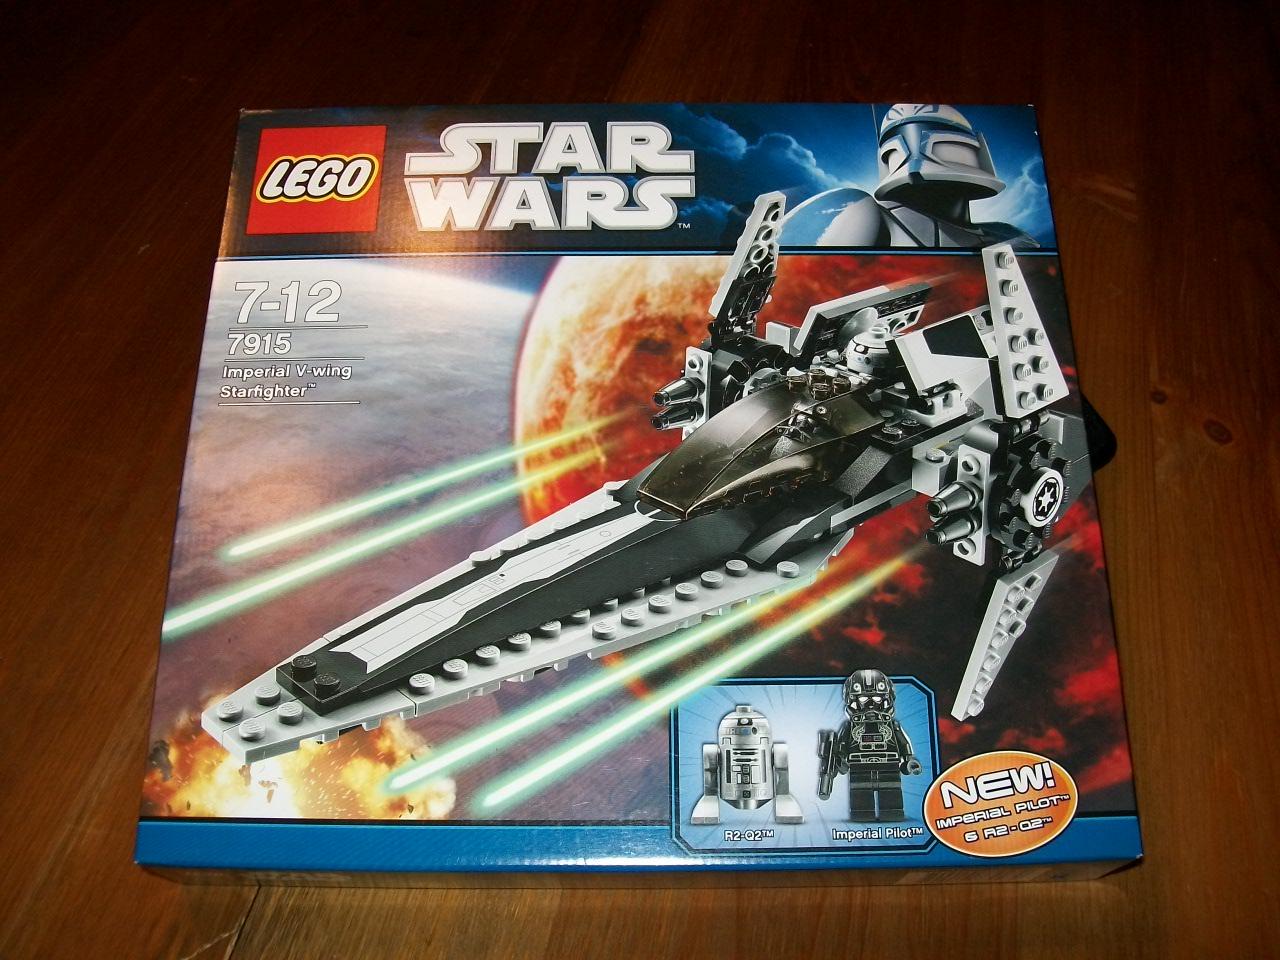 revue du set lego star wars 7915 lego r by alkinoos. Black Bedroom Furniture Sets. Home Design Ideas